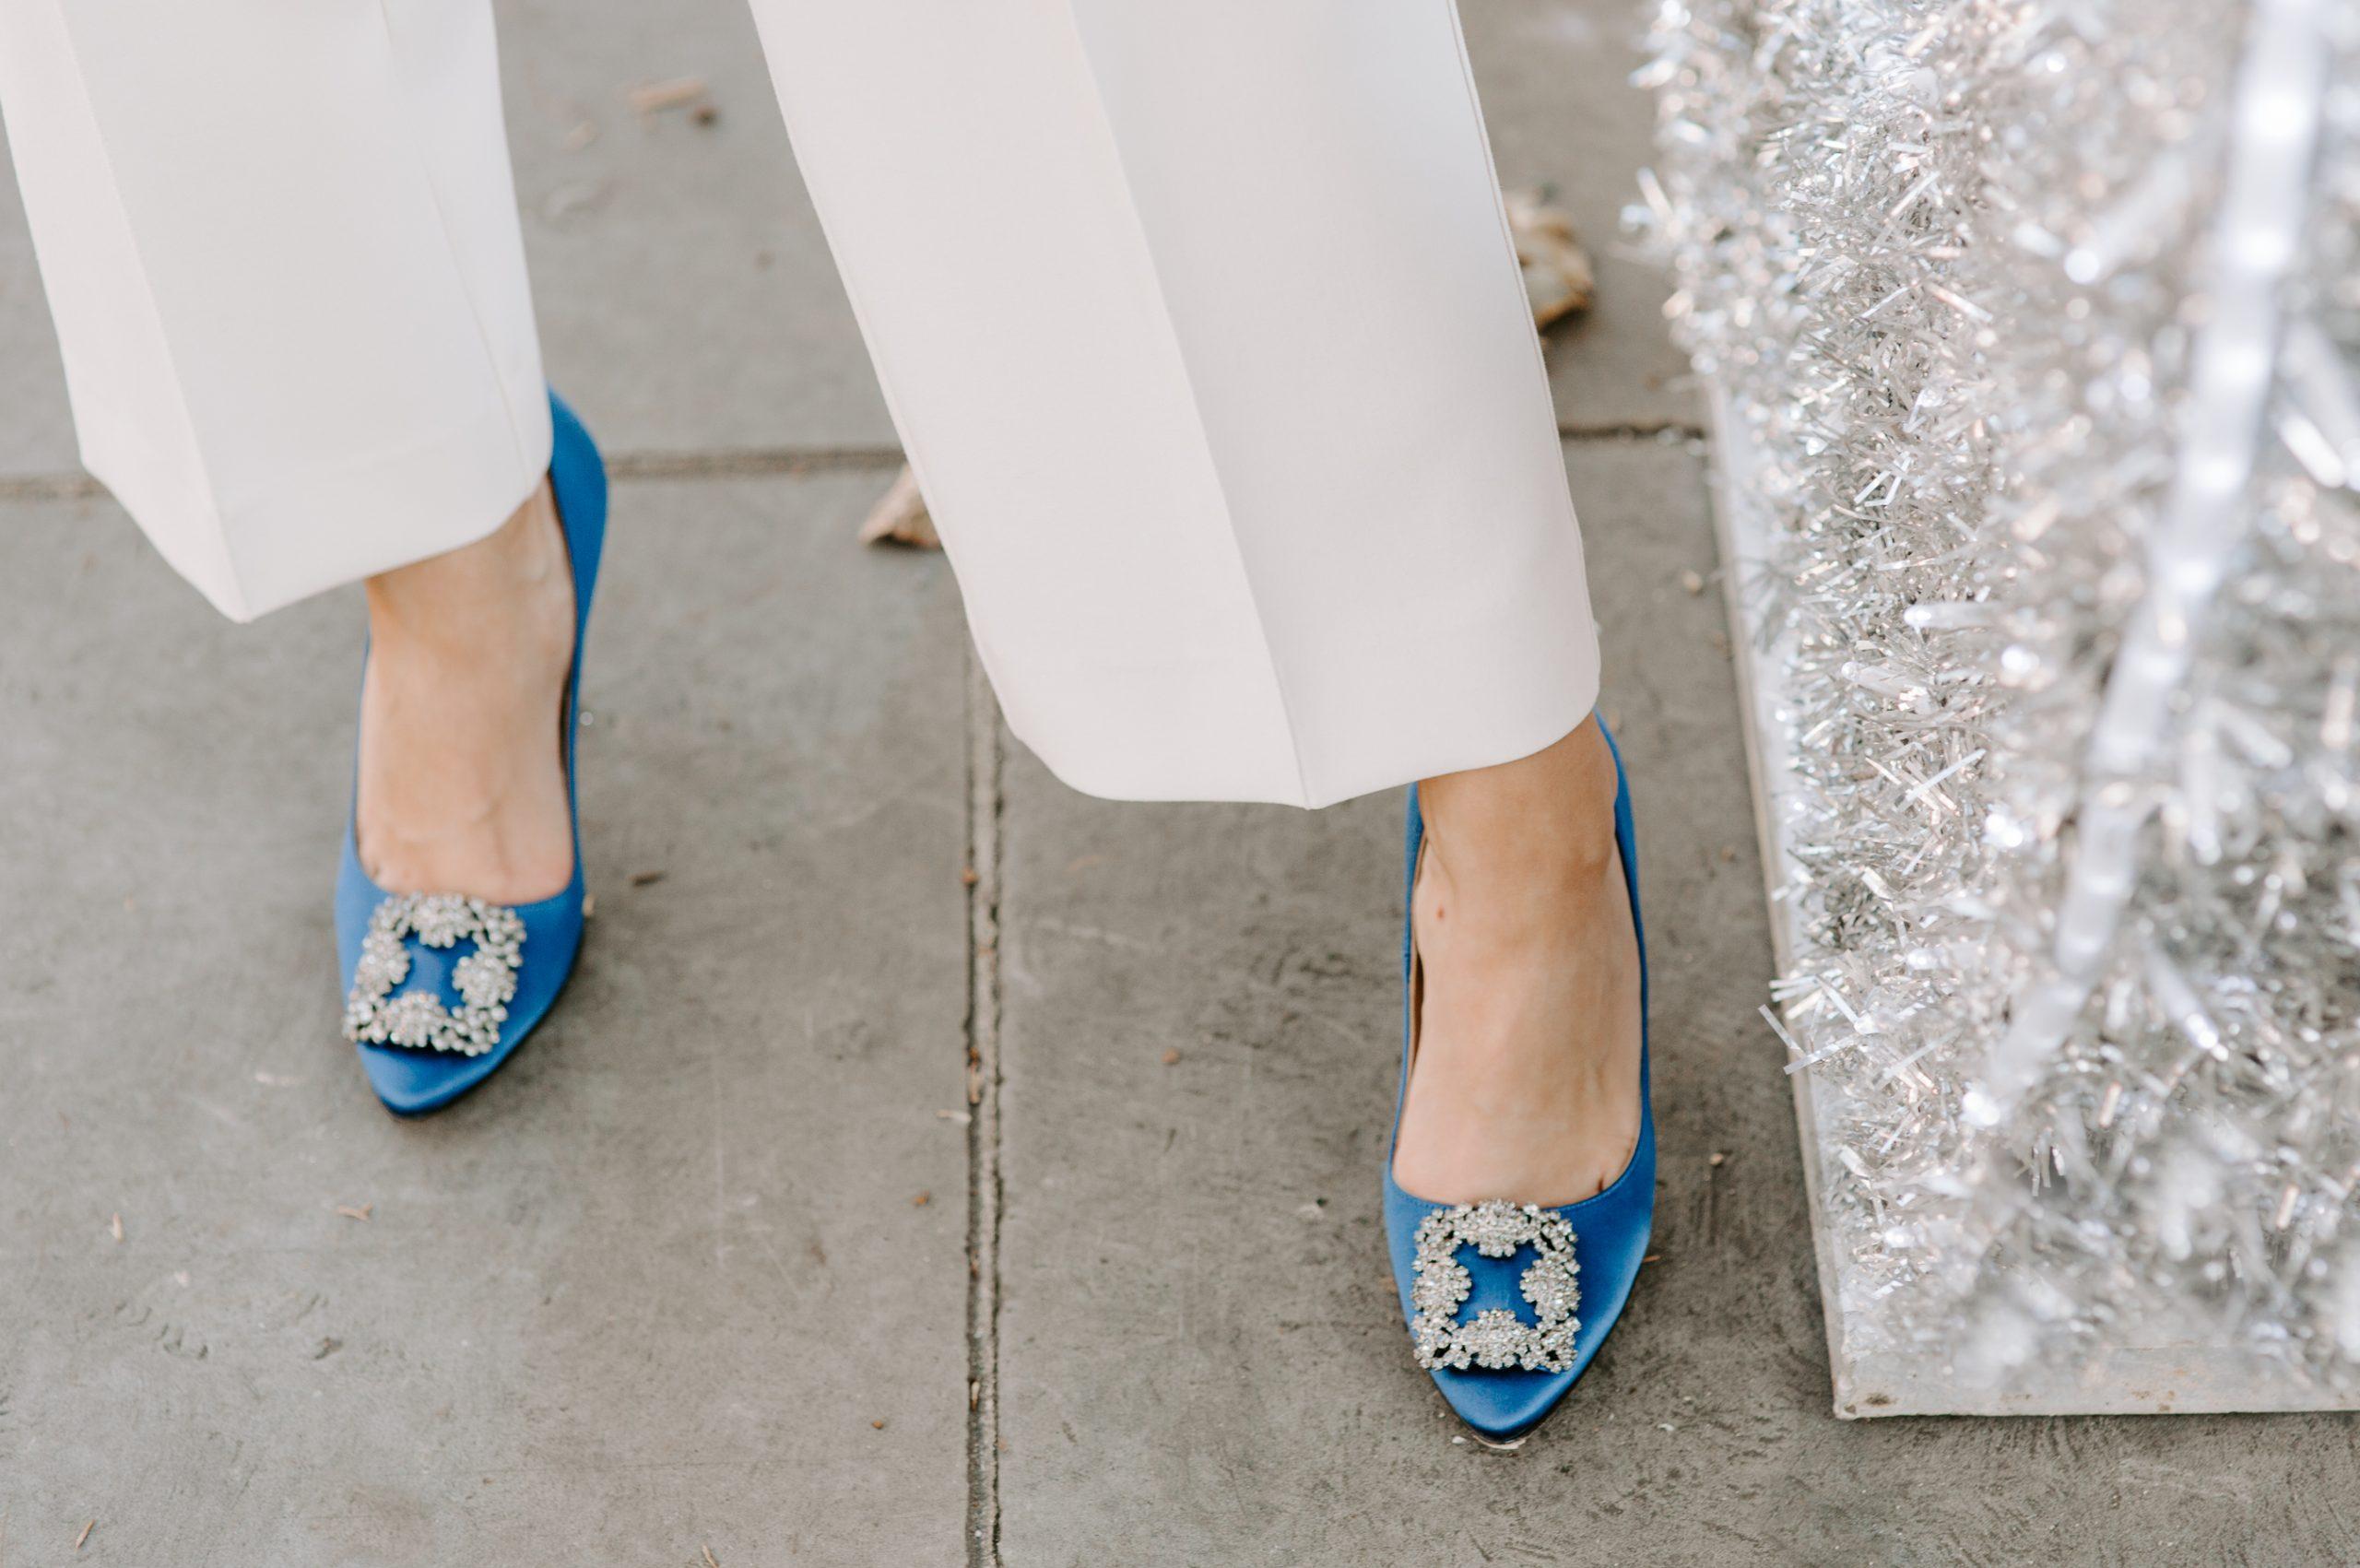 Bride wearing bright blue wedding shoes